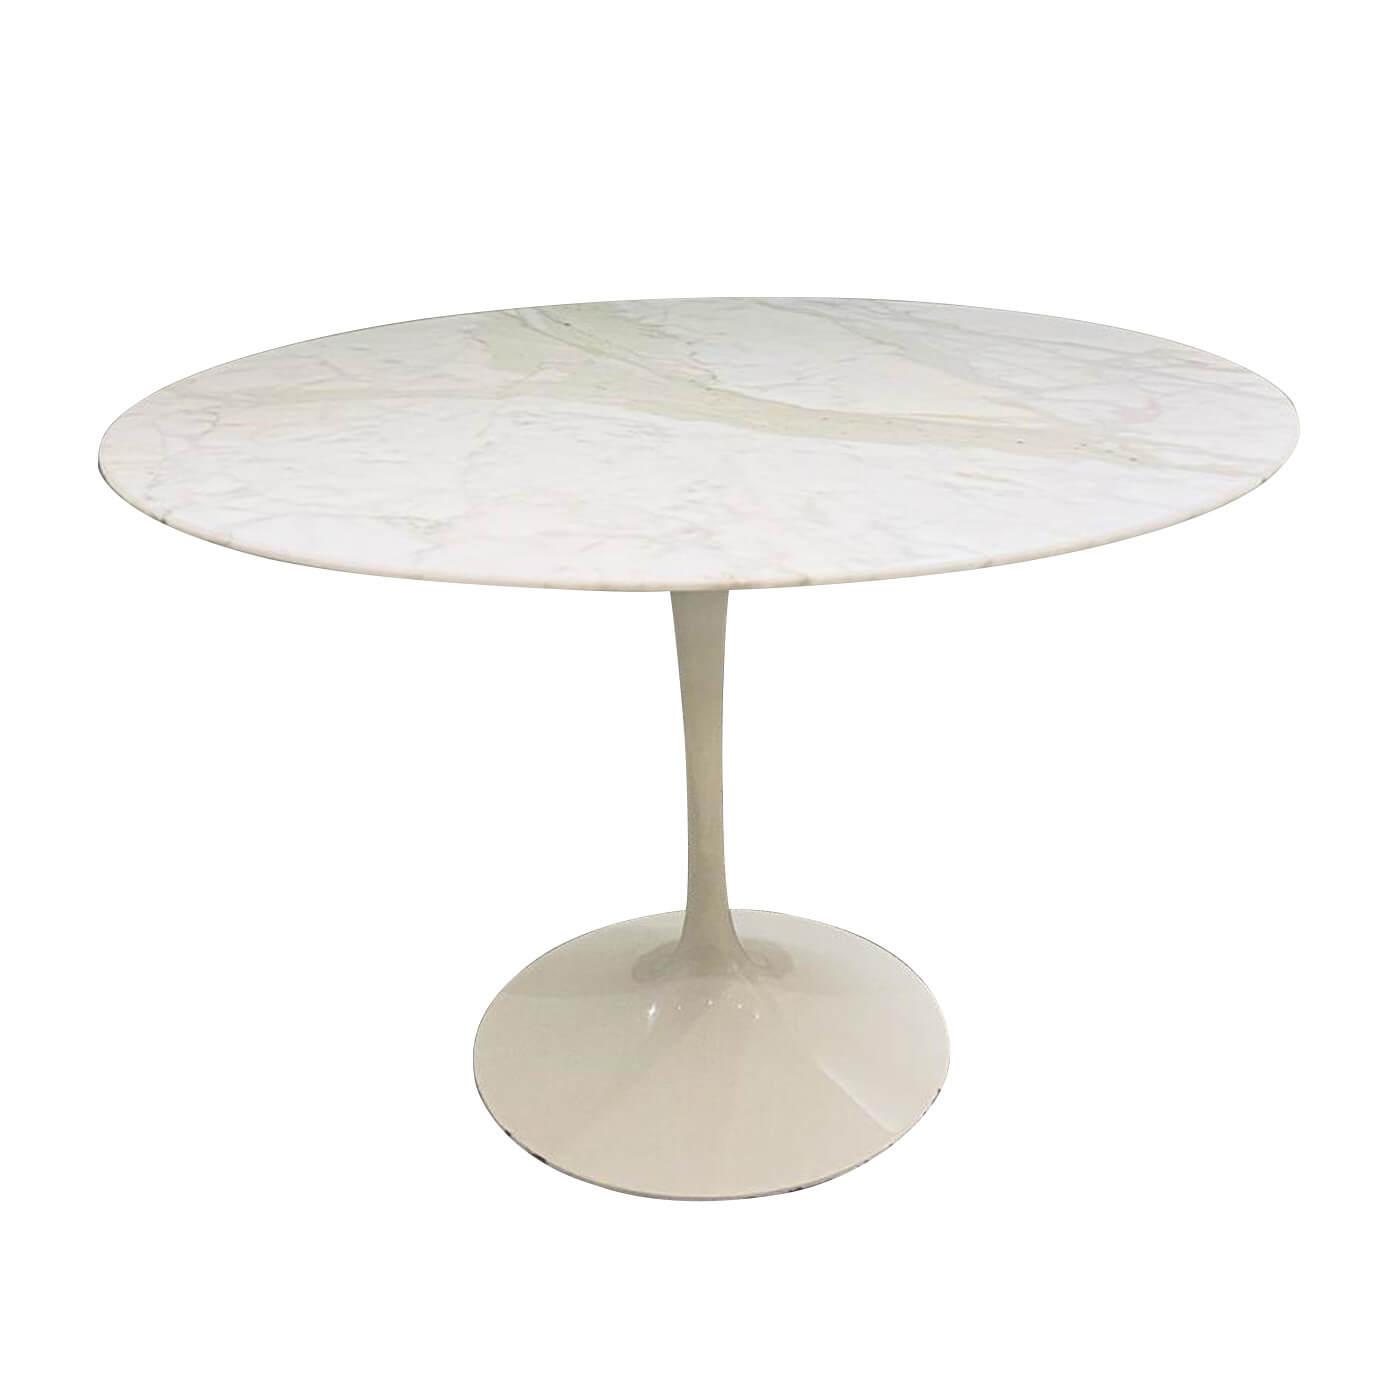 Knoll Saarinen calacutta marble tulip table 120cm